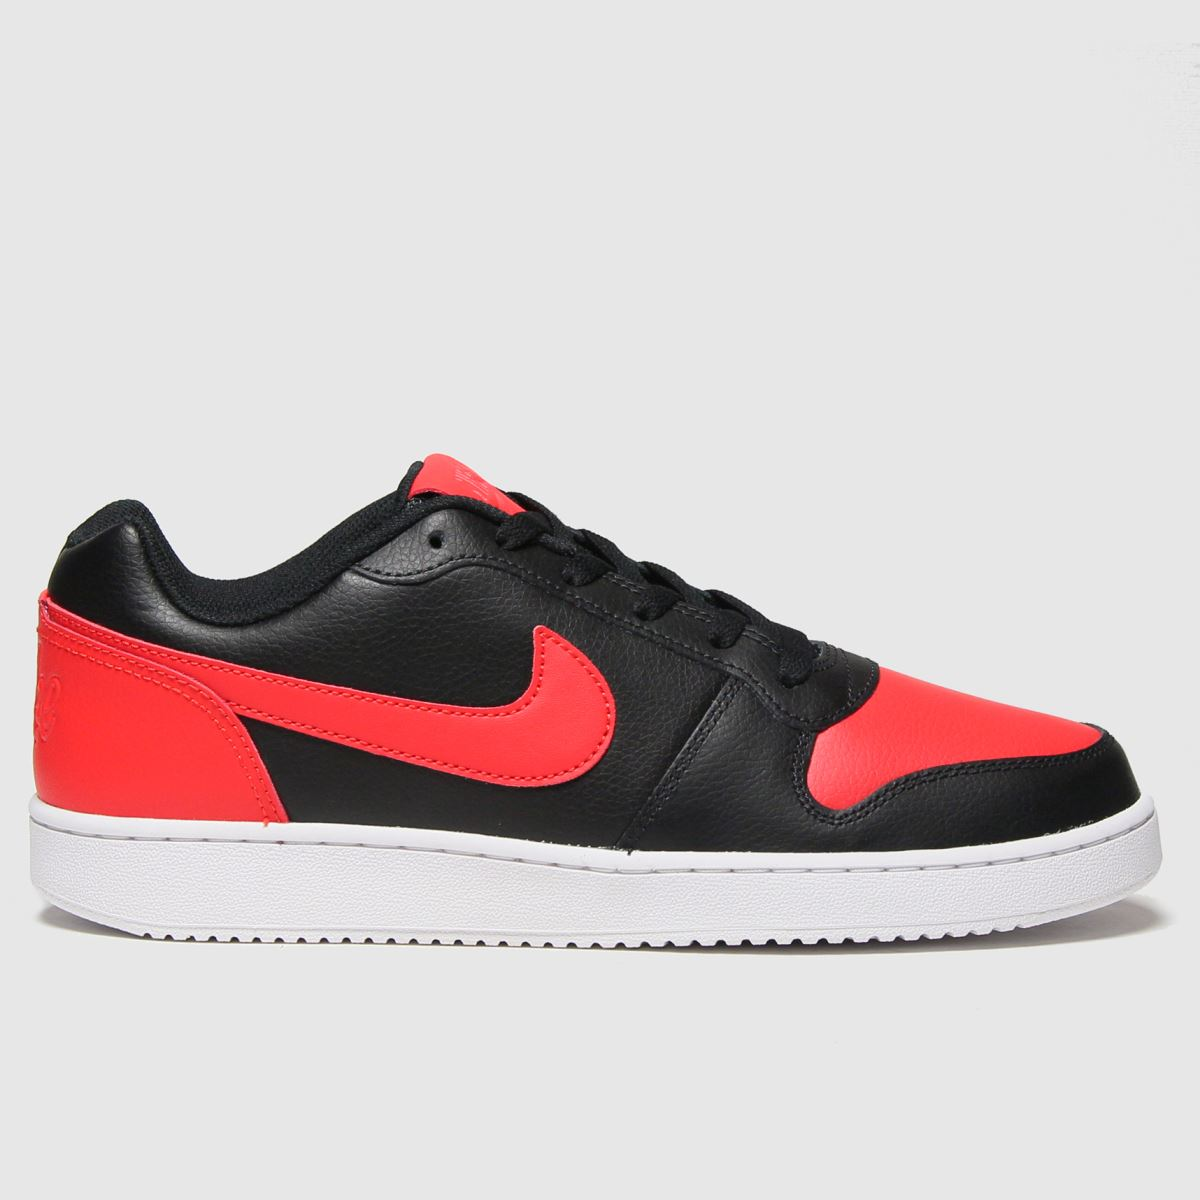 Nike Black & Orange Ebernon Low Trainers